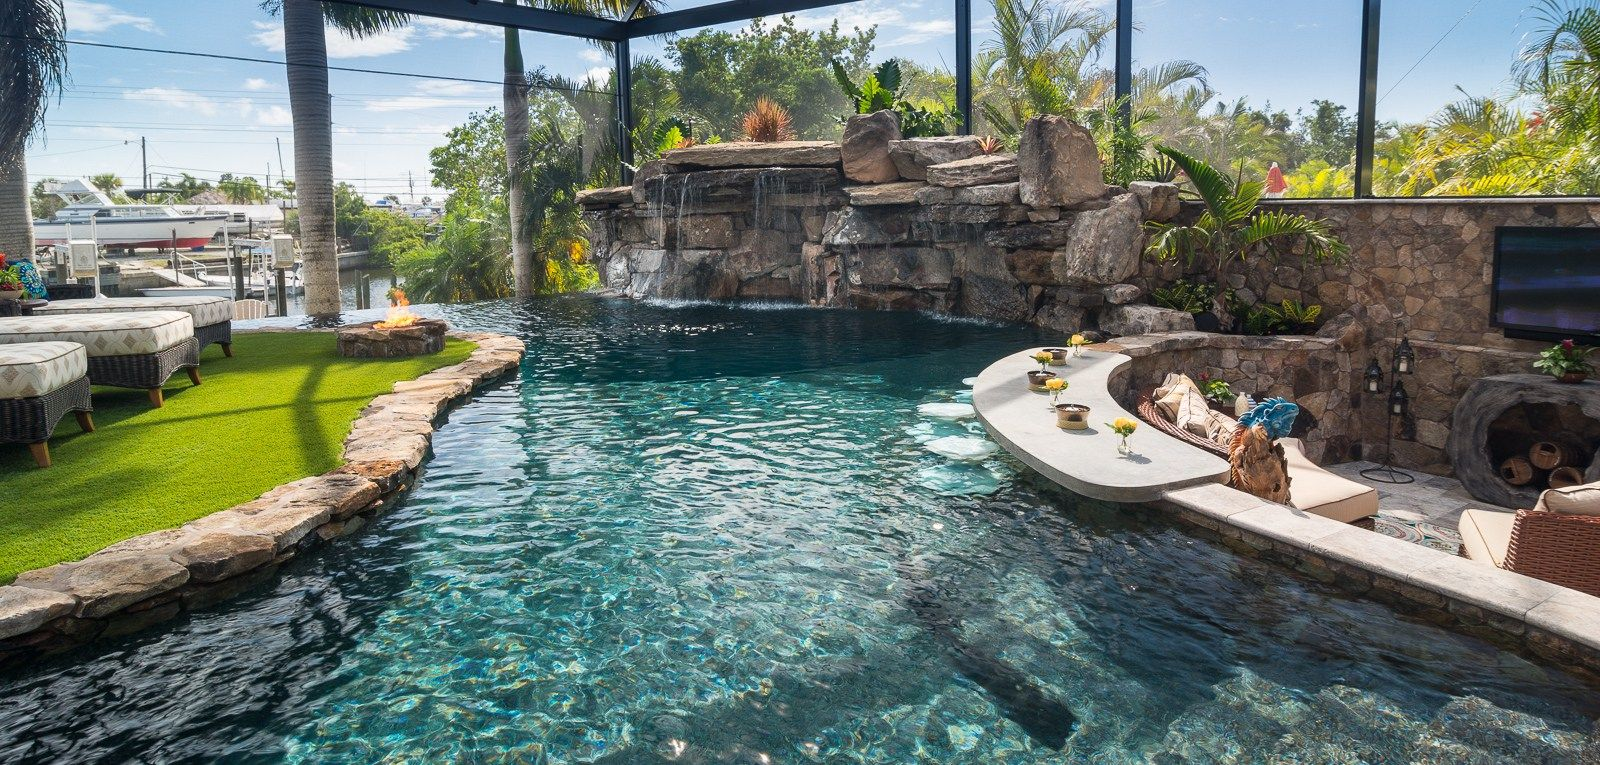 A Lazy River Runs Through It Custom Pool On Pine Island Lazy River Pool Insane Pools Swimming Pools Backyard